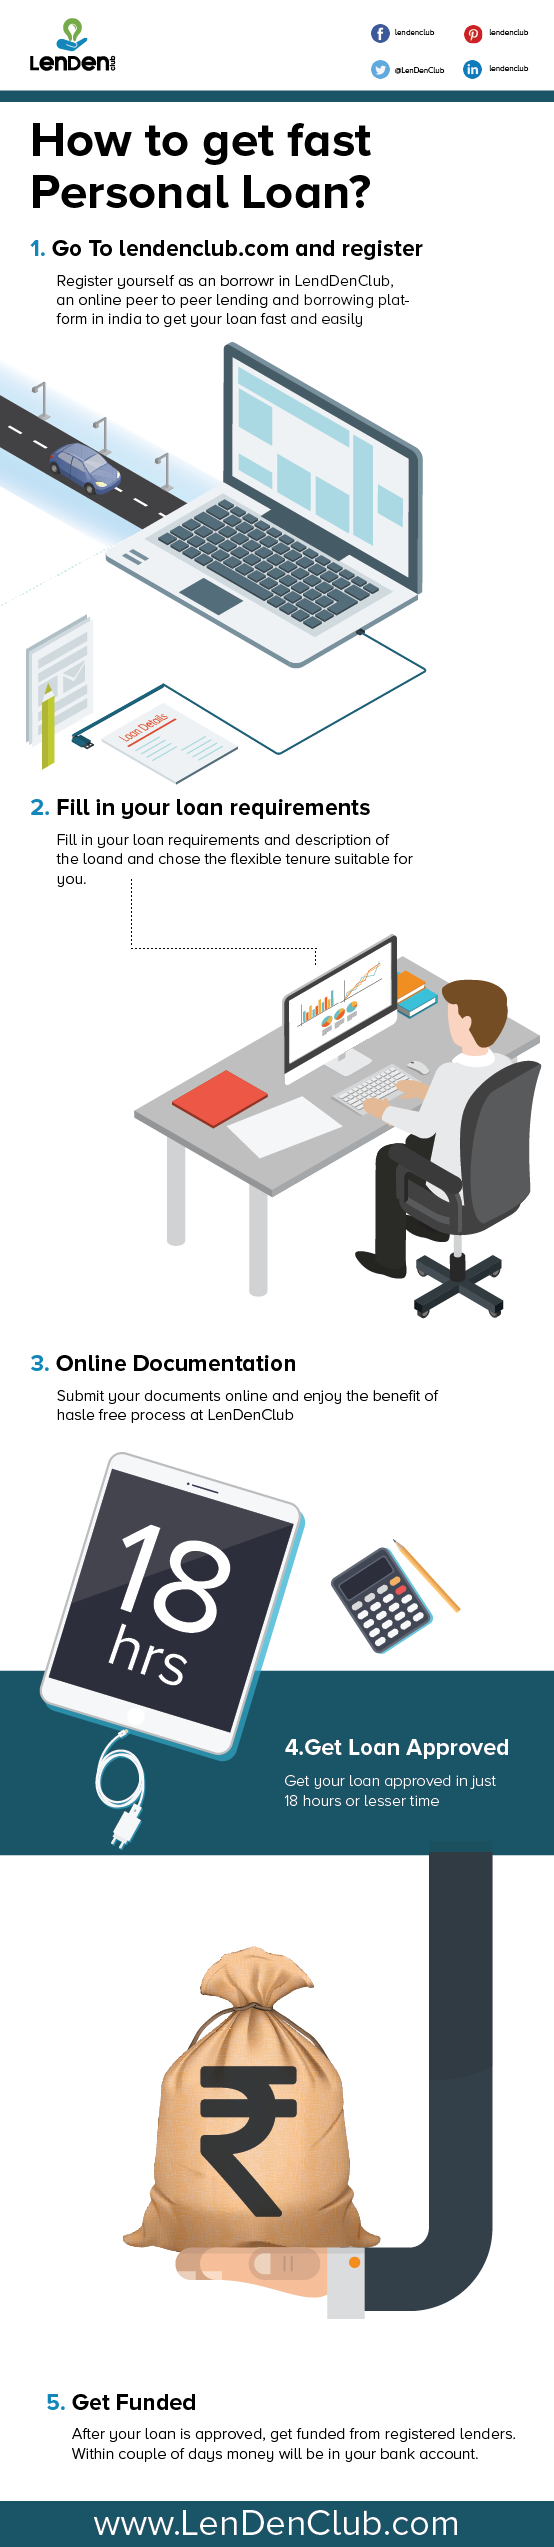 How To Get Fast Personal Loan Personalloan Loan P2p Peertopeer P2plending Lending Borrowing Online Onlinelo Peer To Peer Lending Personal Loans Online